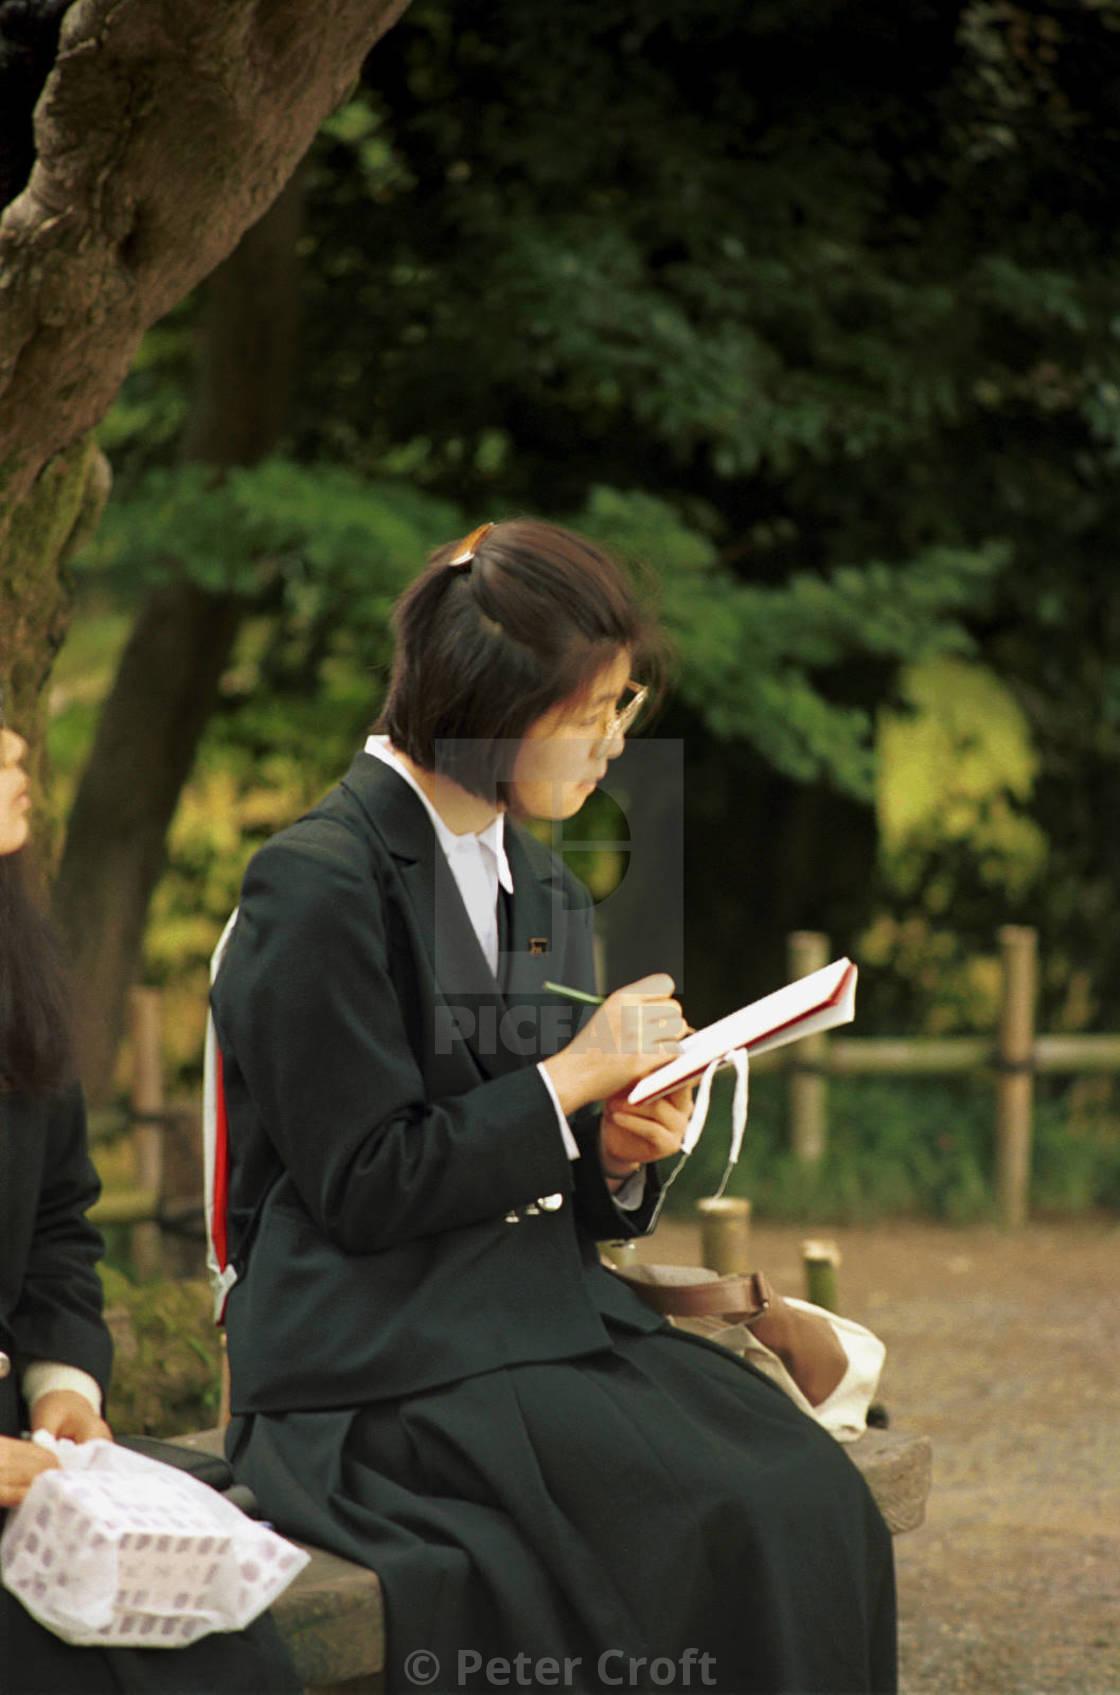 """A schoolgirl studies in a park, Kanazawa, Japan."" stock image"